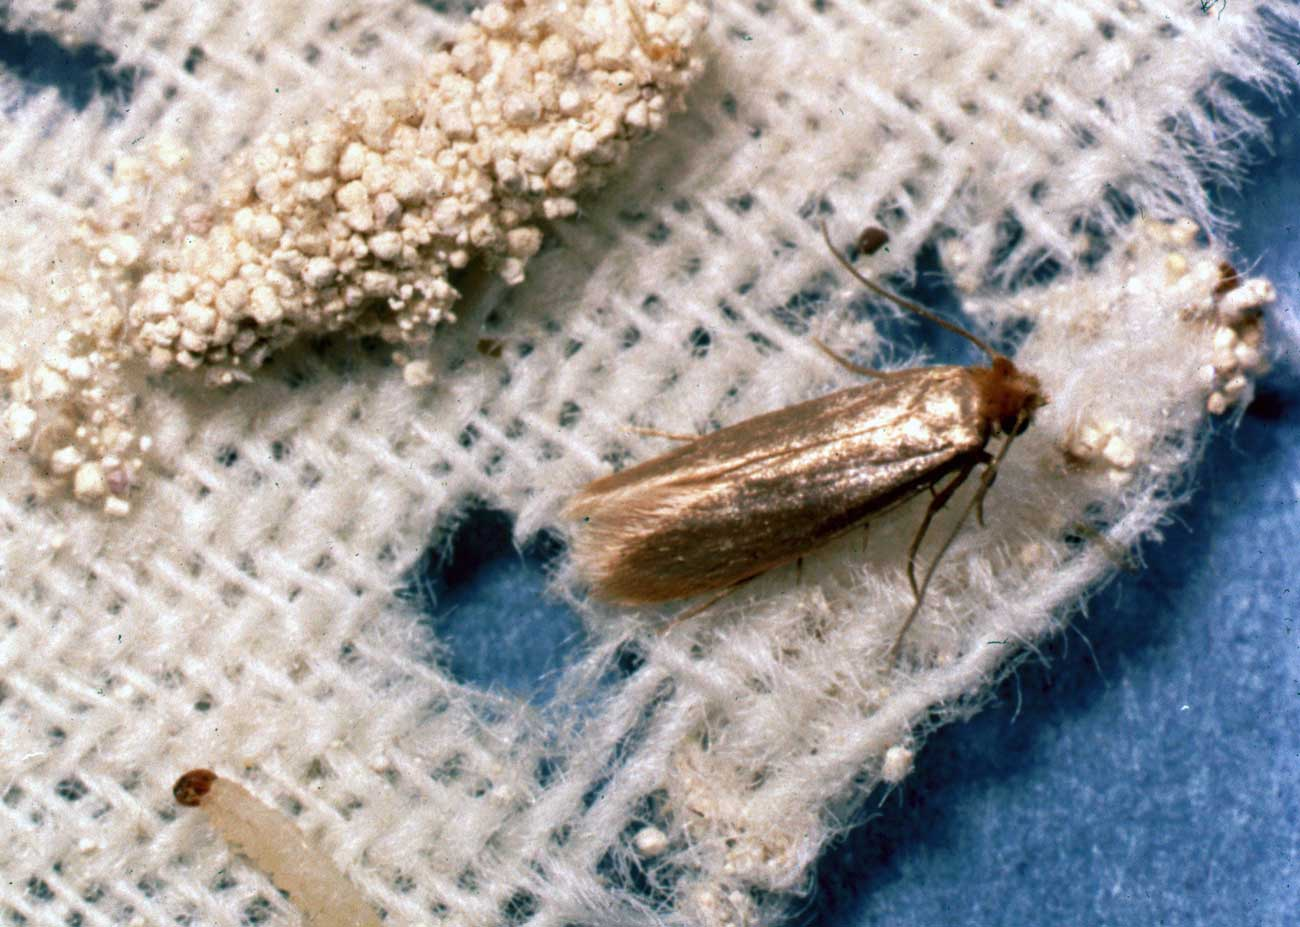 Textile Pests Enviroguard Pest Control